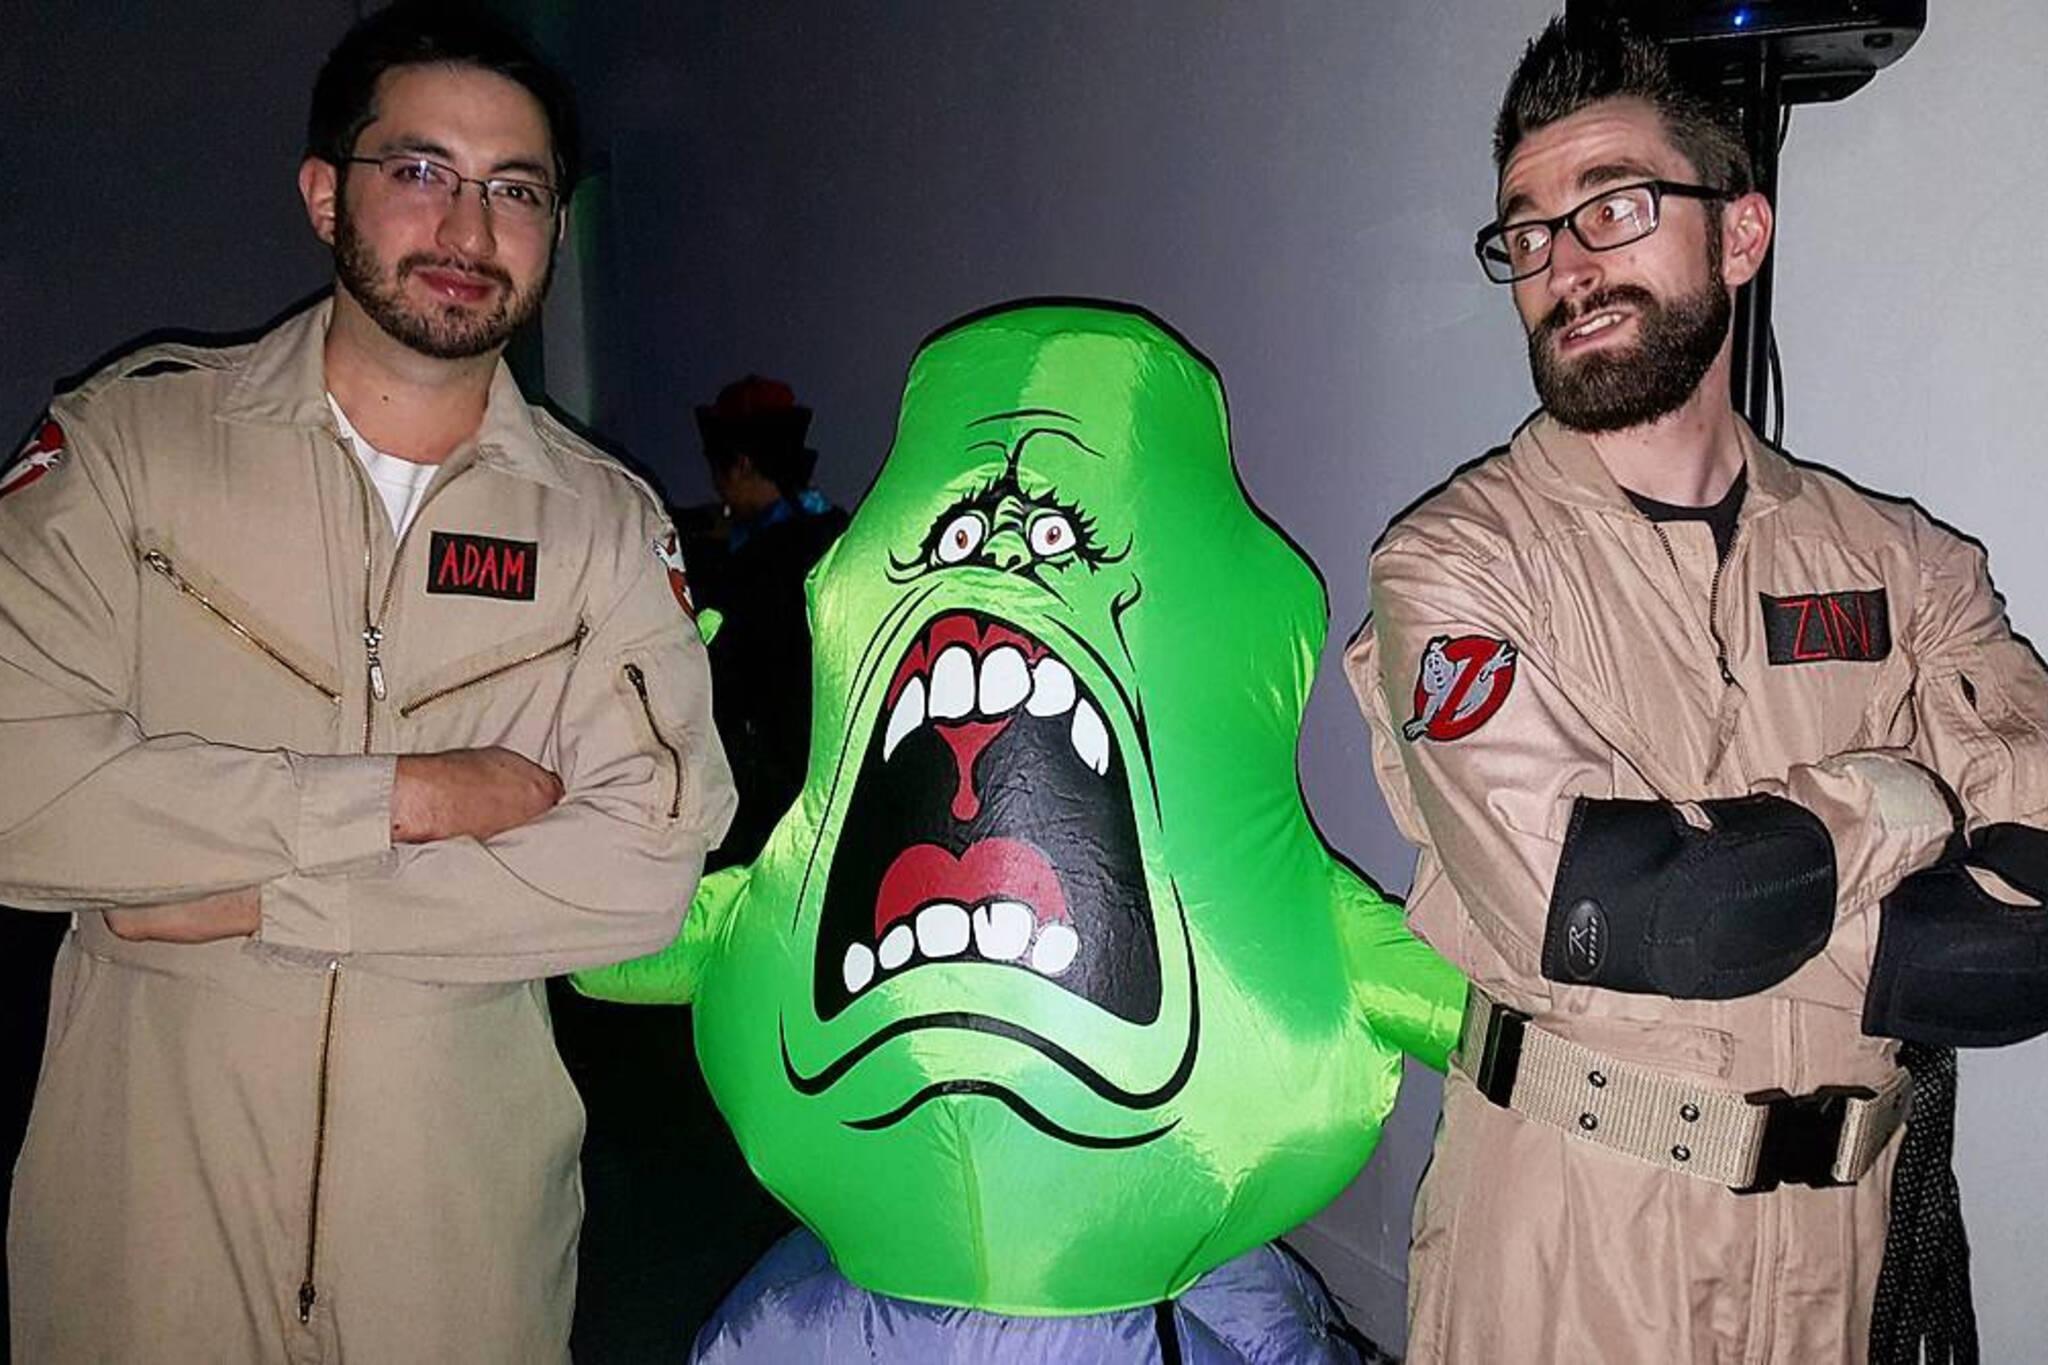 Toronto Halloween costumes